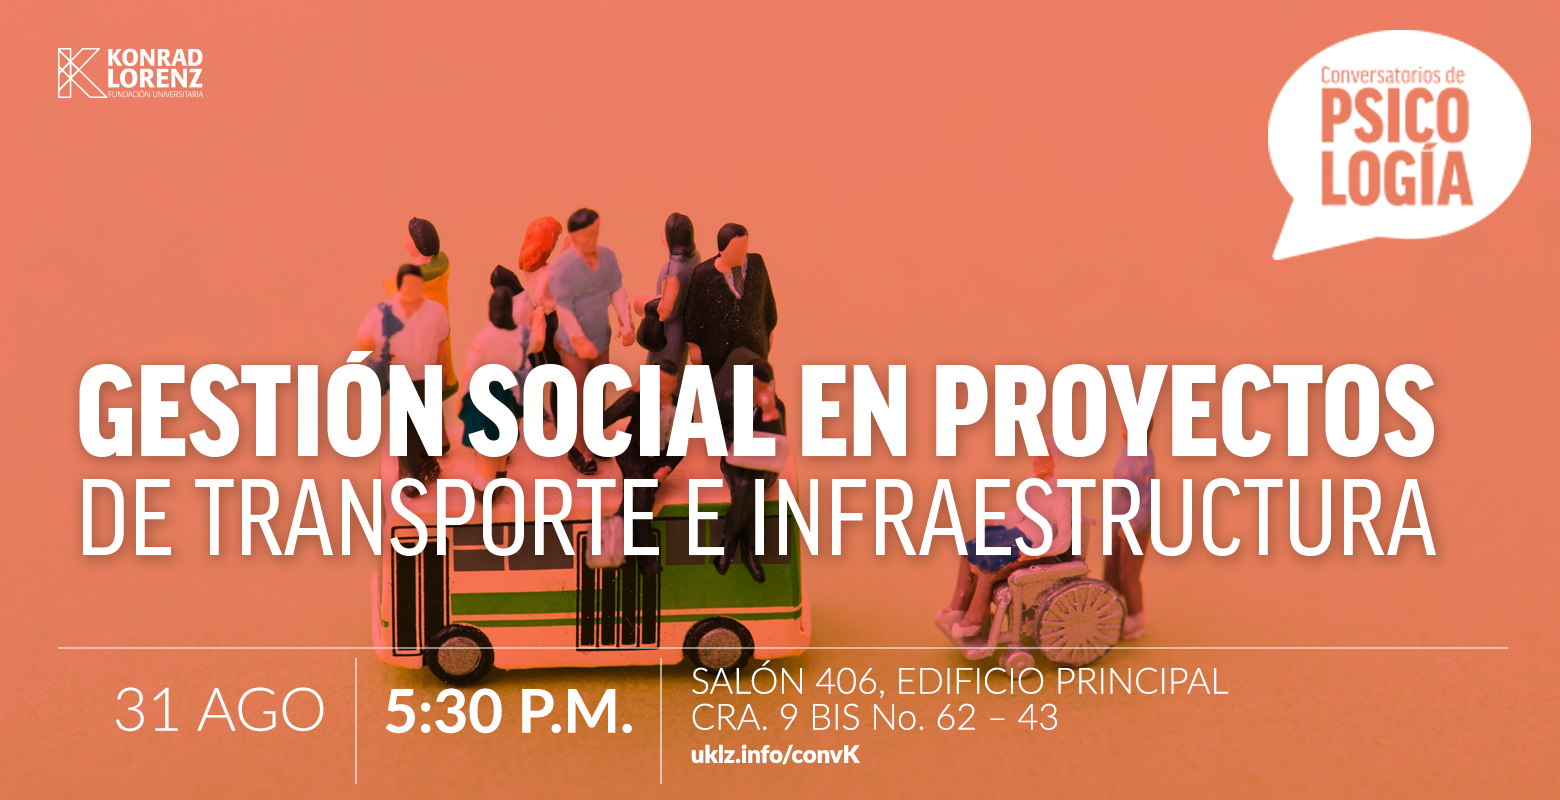 Conversatorio: Gestión Social de Proyectos de transporte e Infraestructura